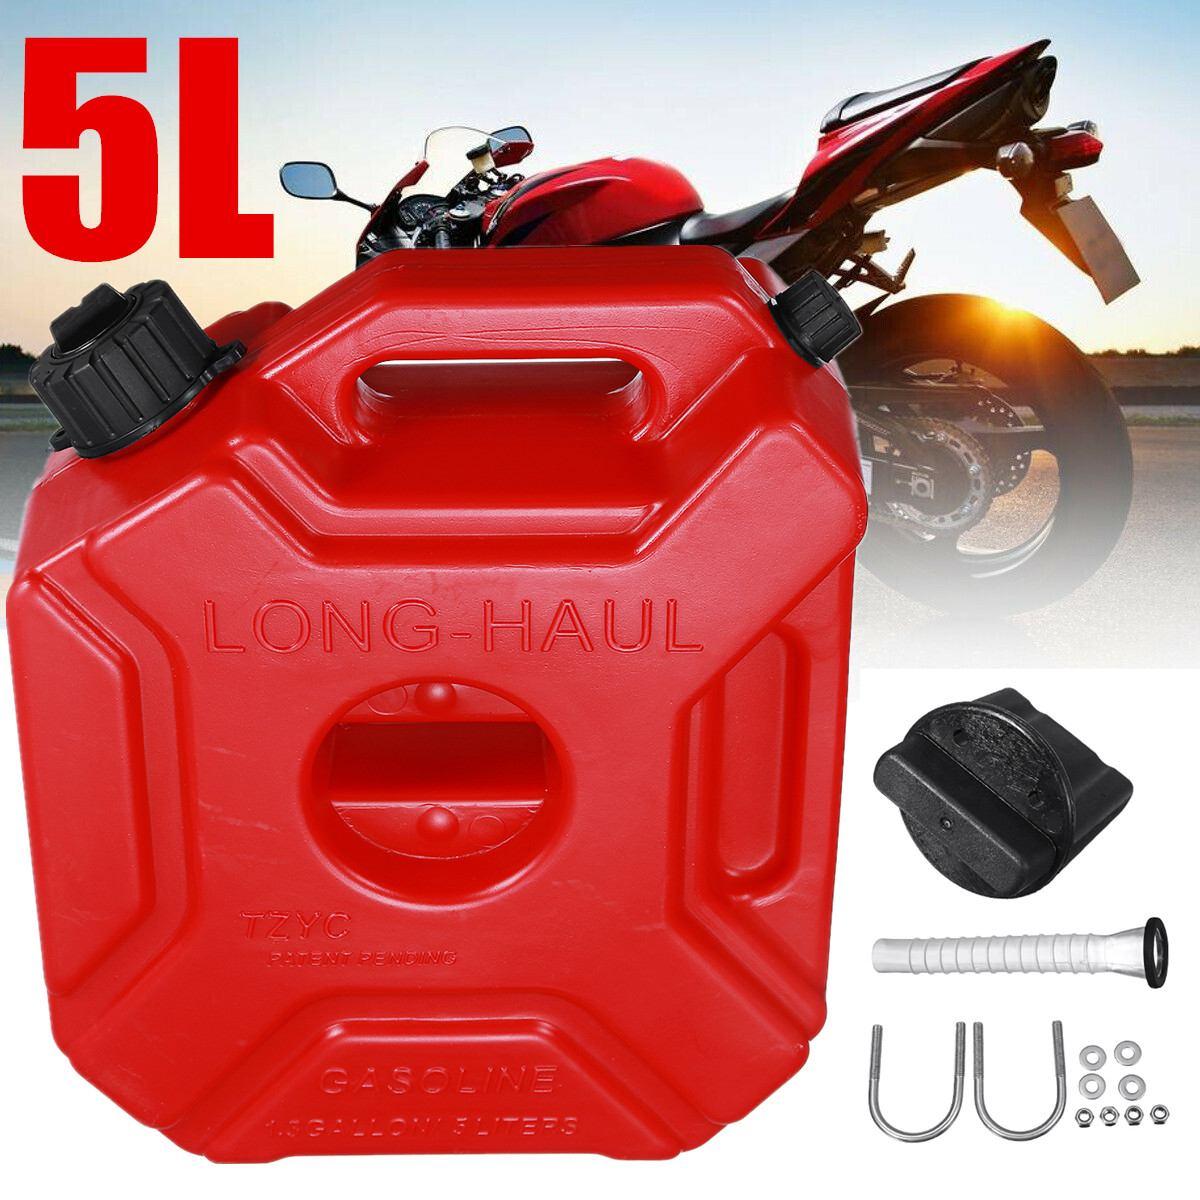 Partol 5l 연료 탱크 플라스틱 가솔린 캔 자동차 제리 수 오토바이 jerrycan 가스 수 가솔린 오일 컨테이너 연료 용기